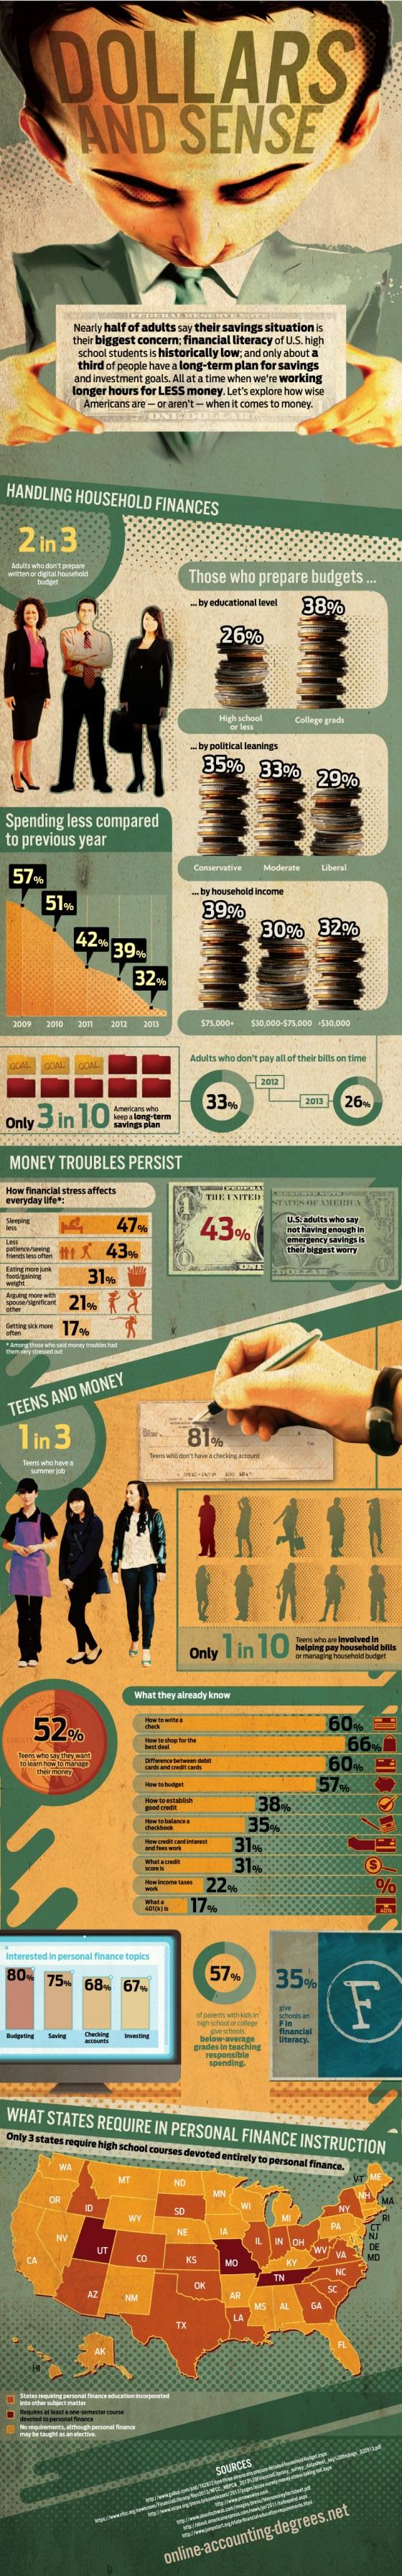 Infographic:Dollars and Sense